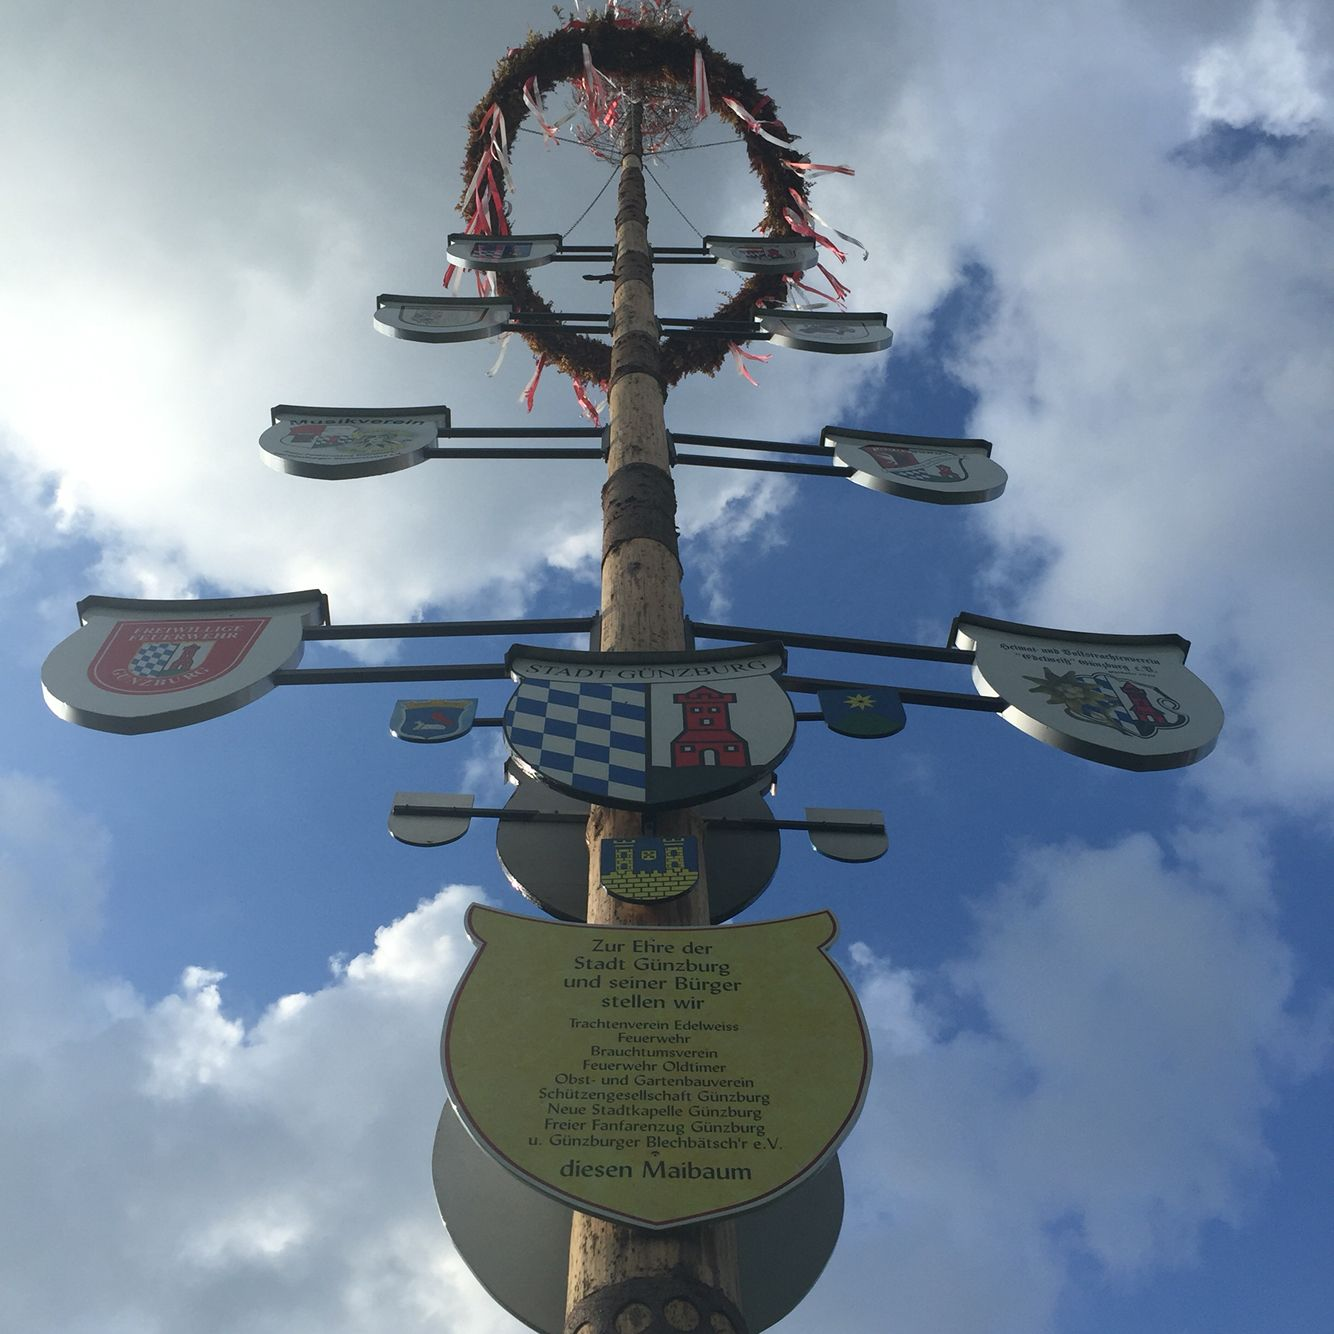 Gunzburg, germania, baviera, 9 giugno 2016